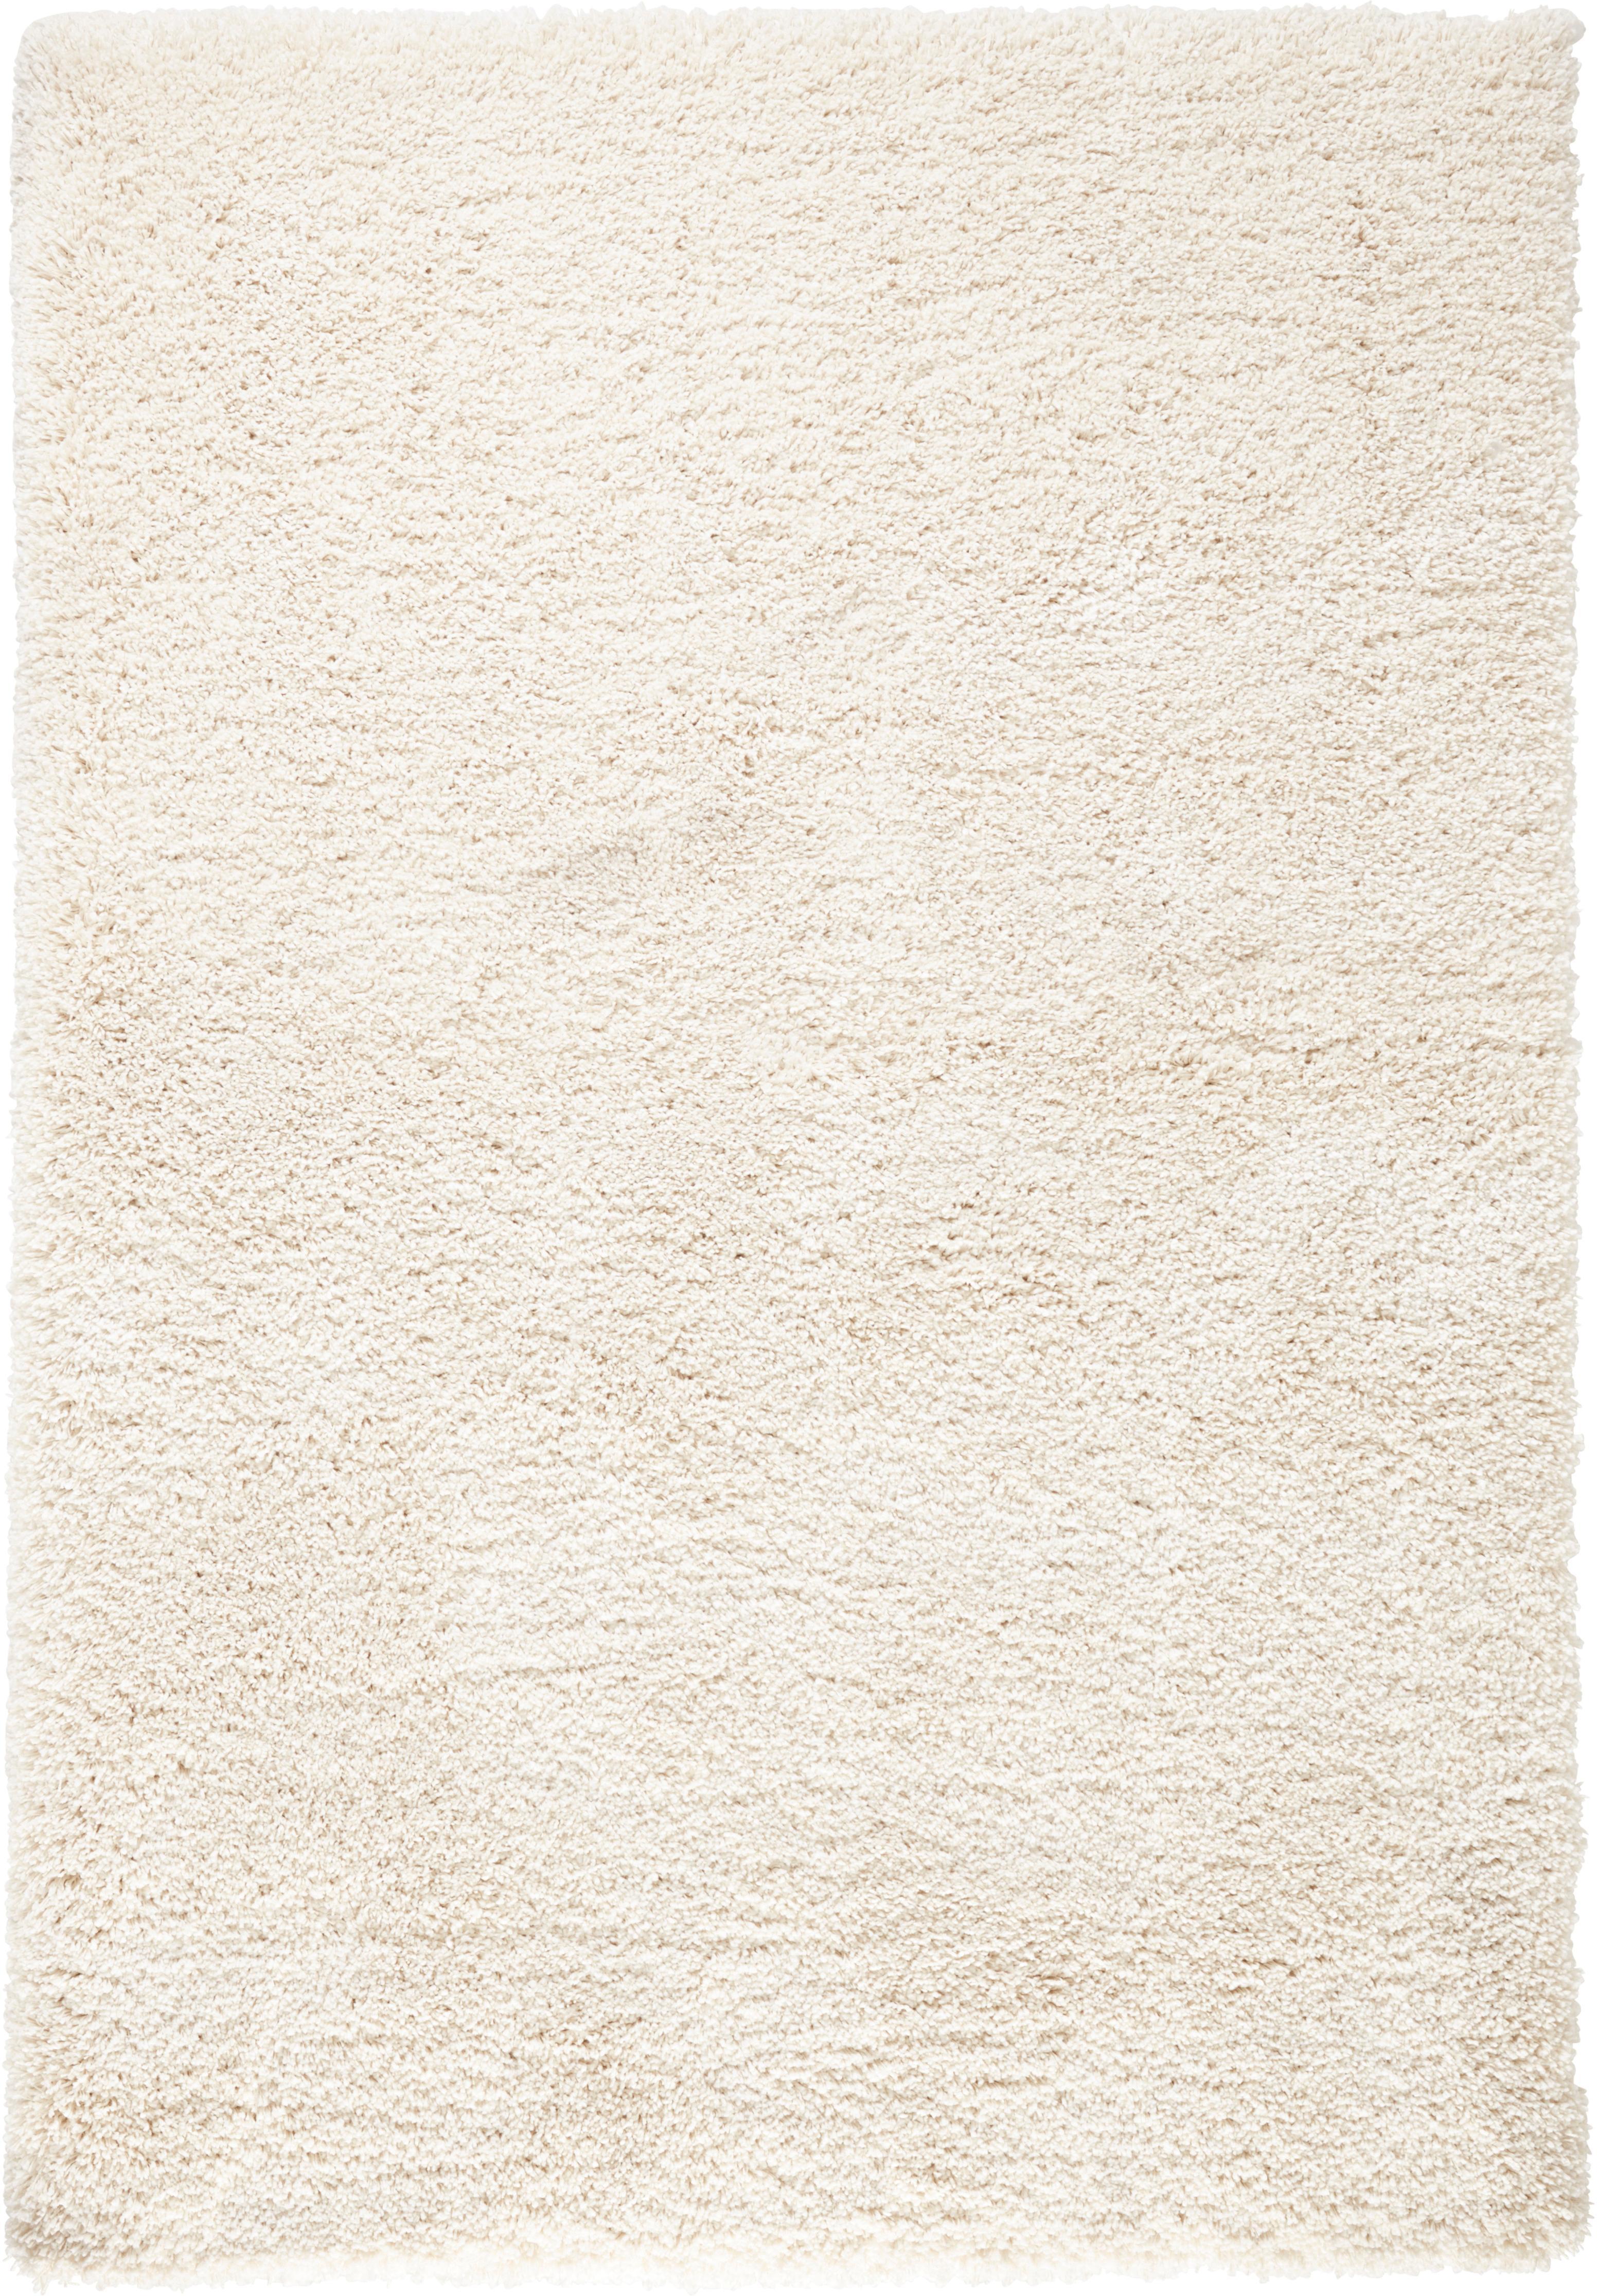 Alfombra de pelo largo Venice, Parte superior: polipropileno, Reverso: yute, Crema, An 120 x L 170 cm (Tamaño S)